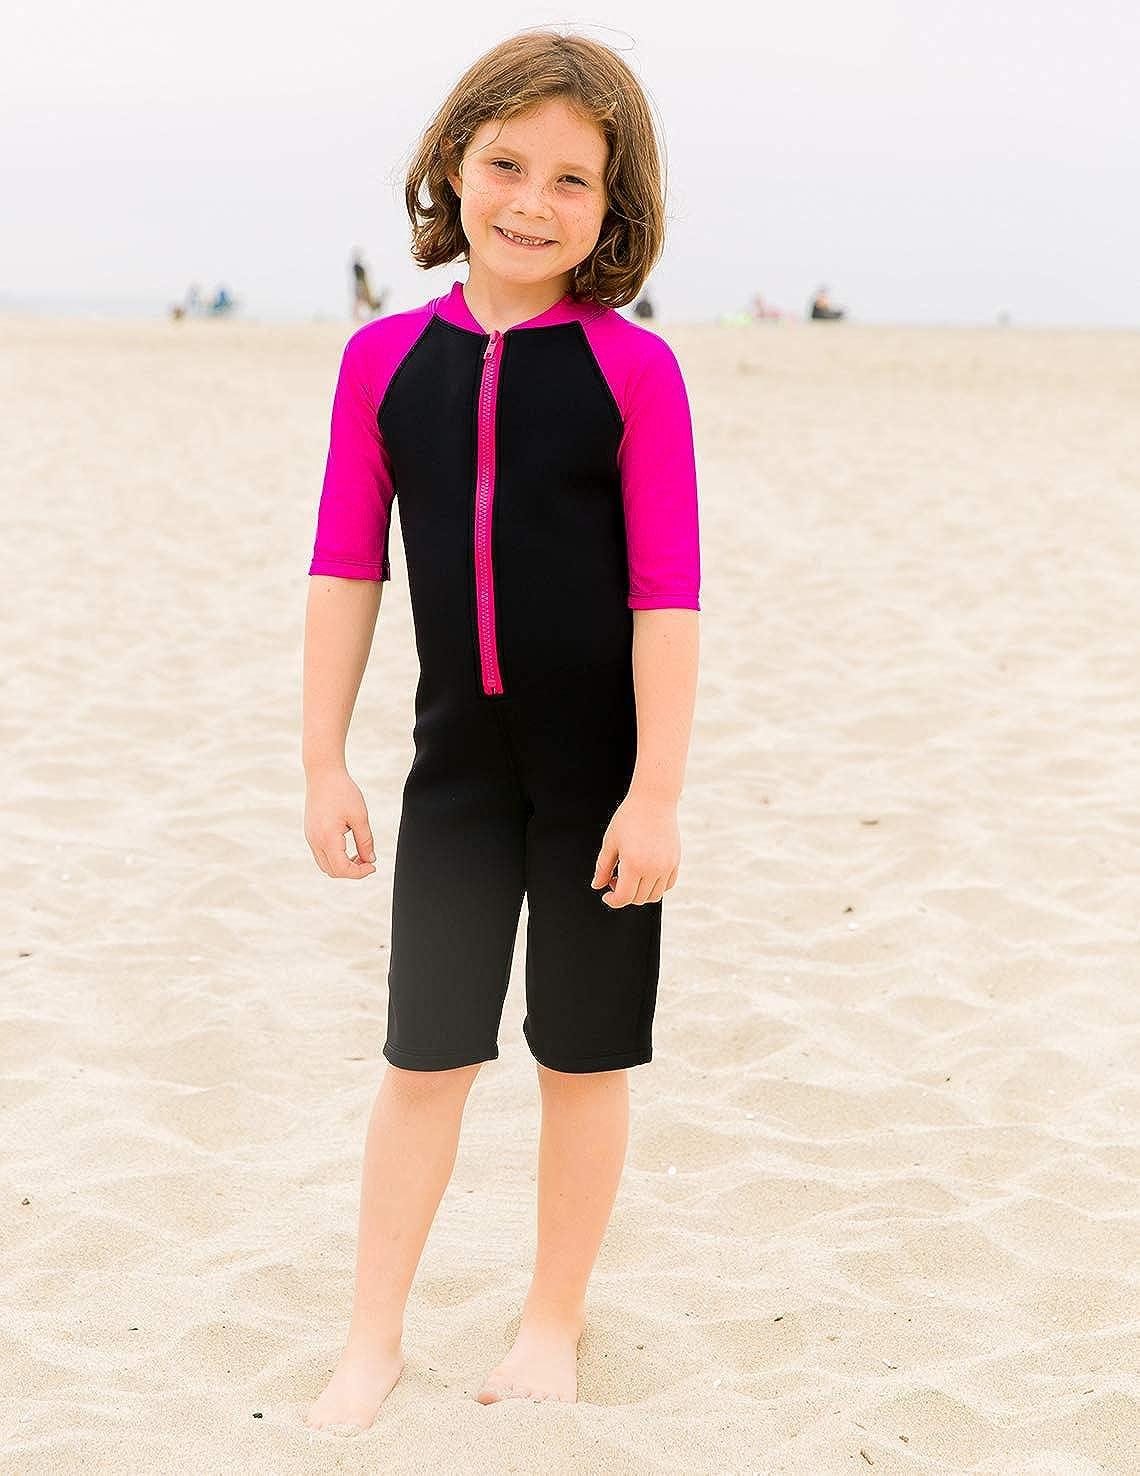 Amazon.com: Tuga Girls térmica traje de neopreno ...